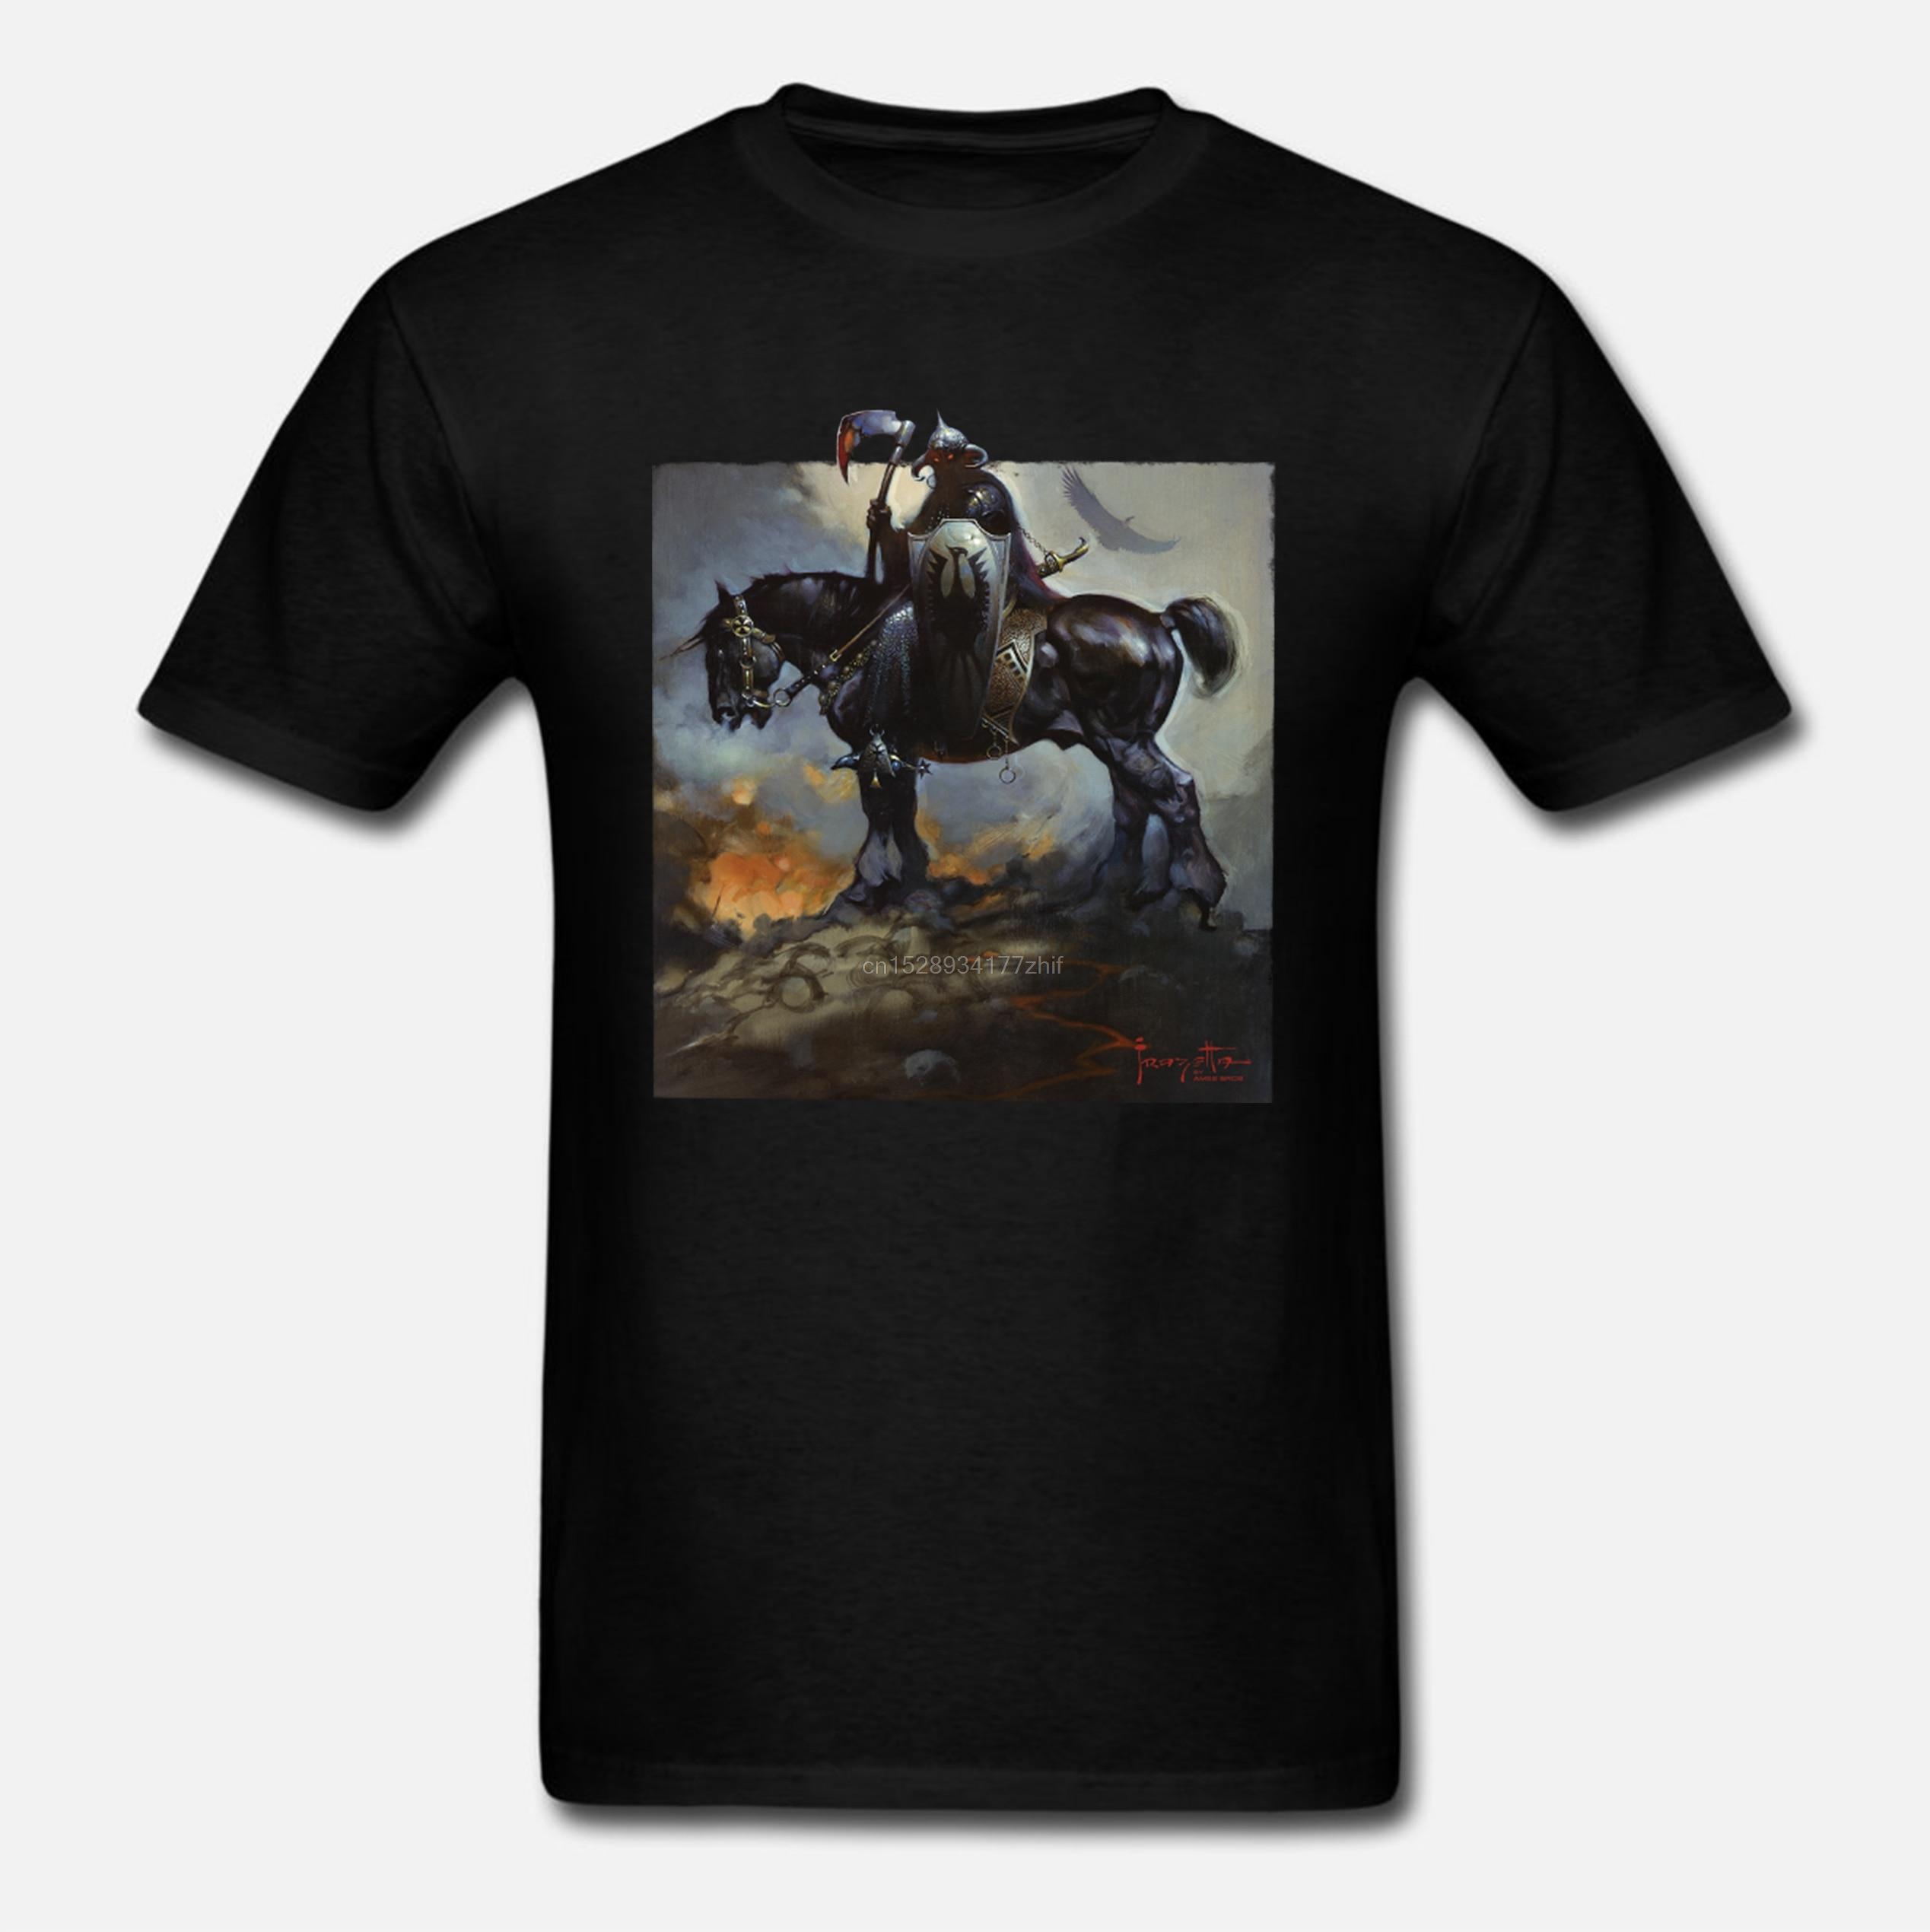 ildan funny t shirts  Frazetta by Ames Bros Death Dealer T-Shirt Men Short Sleeve Oneck Tee Shirts